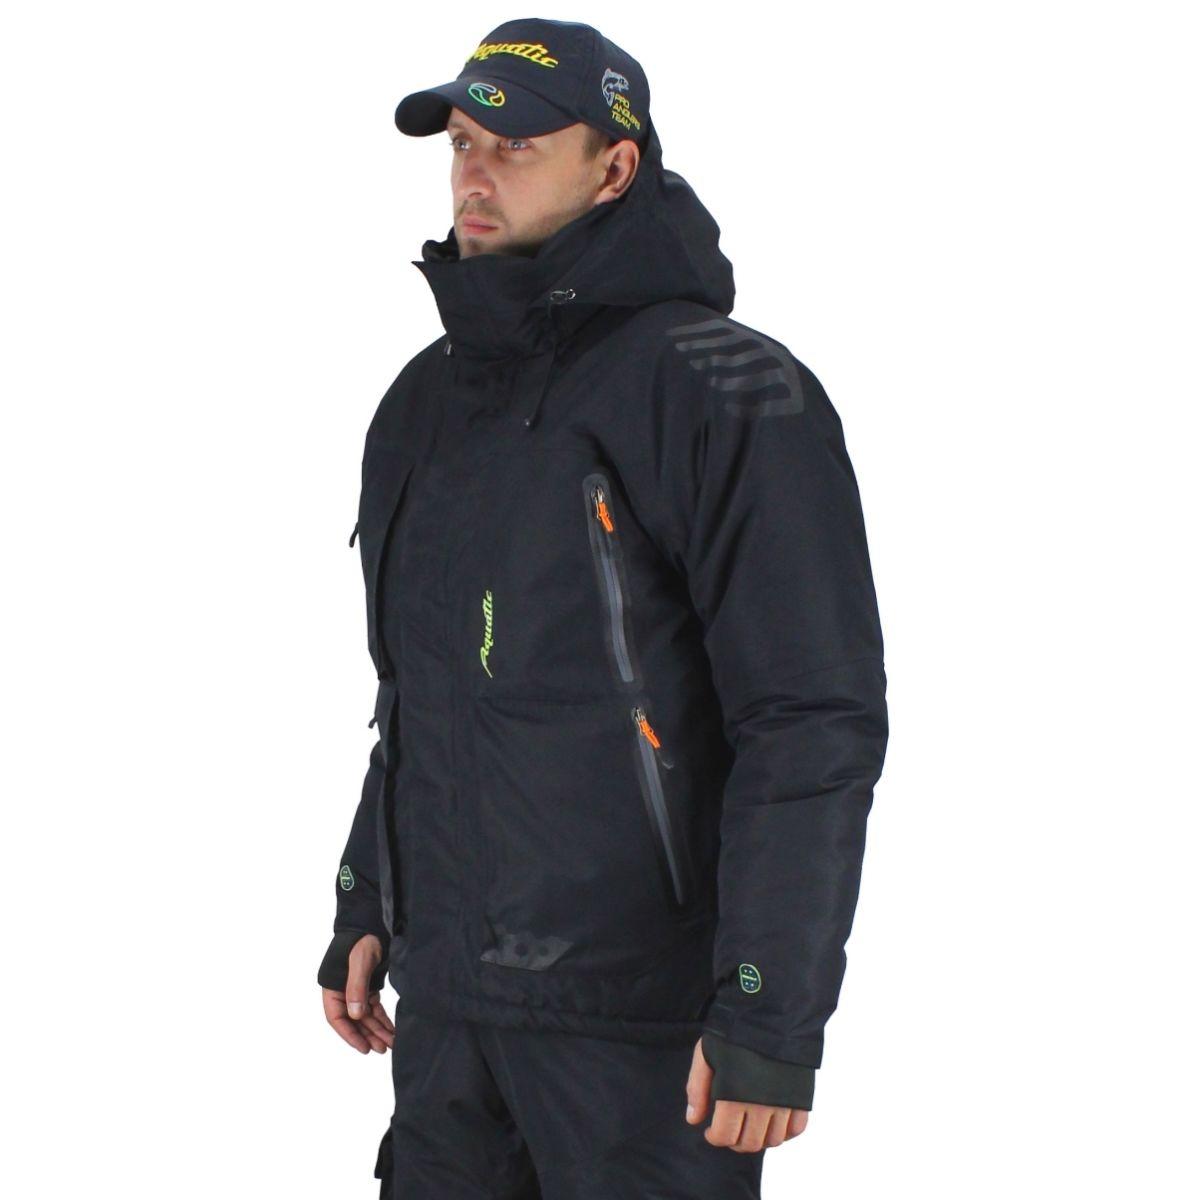 Winter Jacket Aquatic кк-14ч, Black кк-14ч 48-50